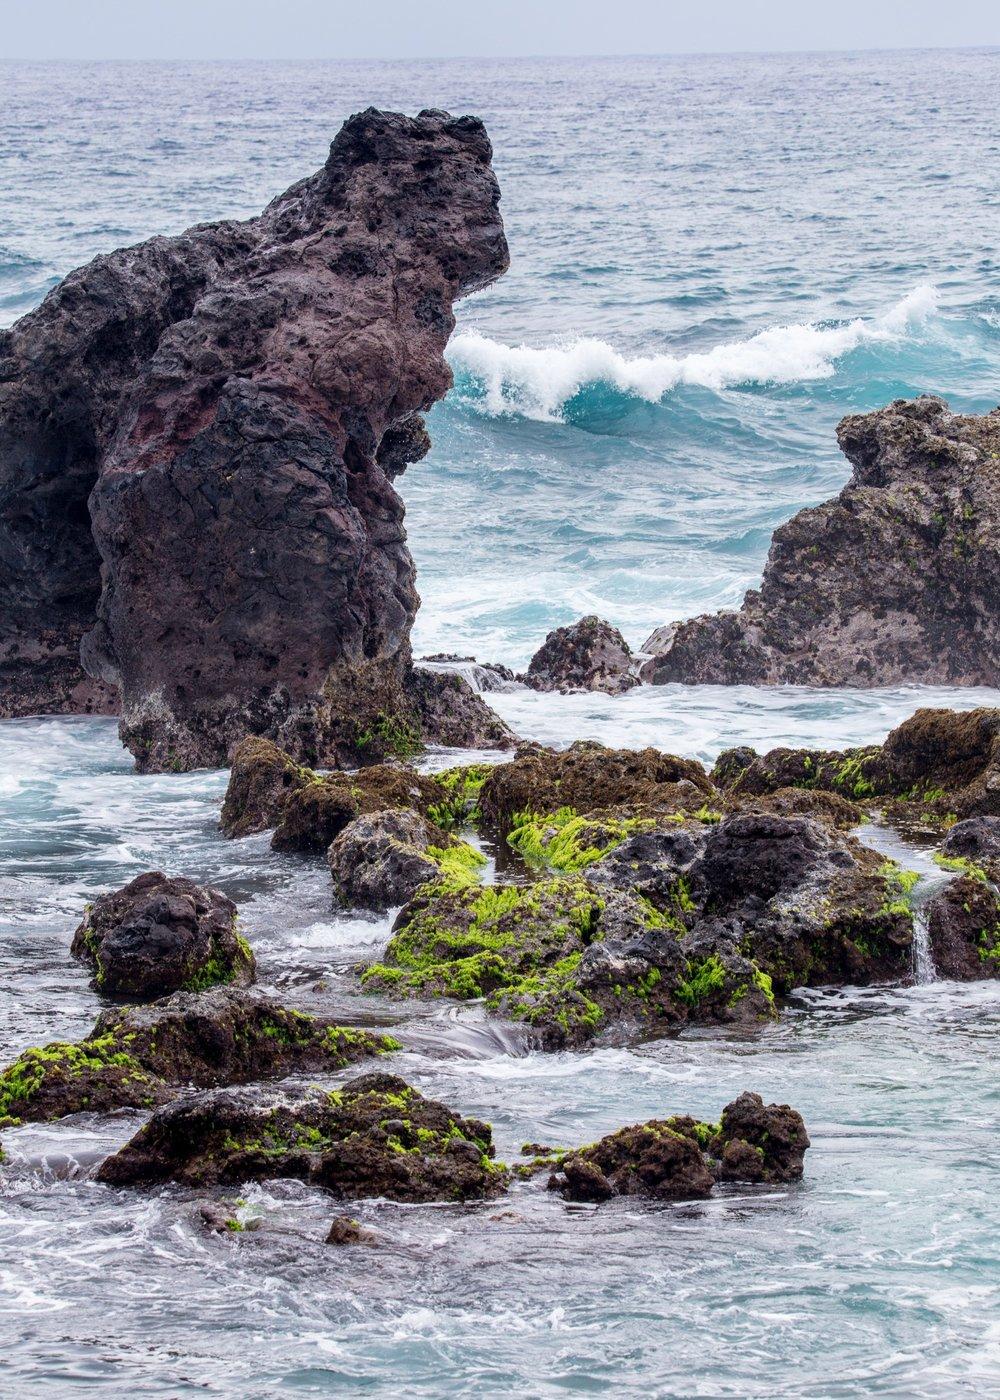 The rocky shoreline